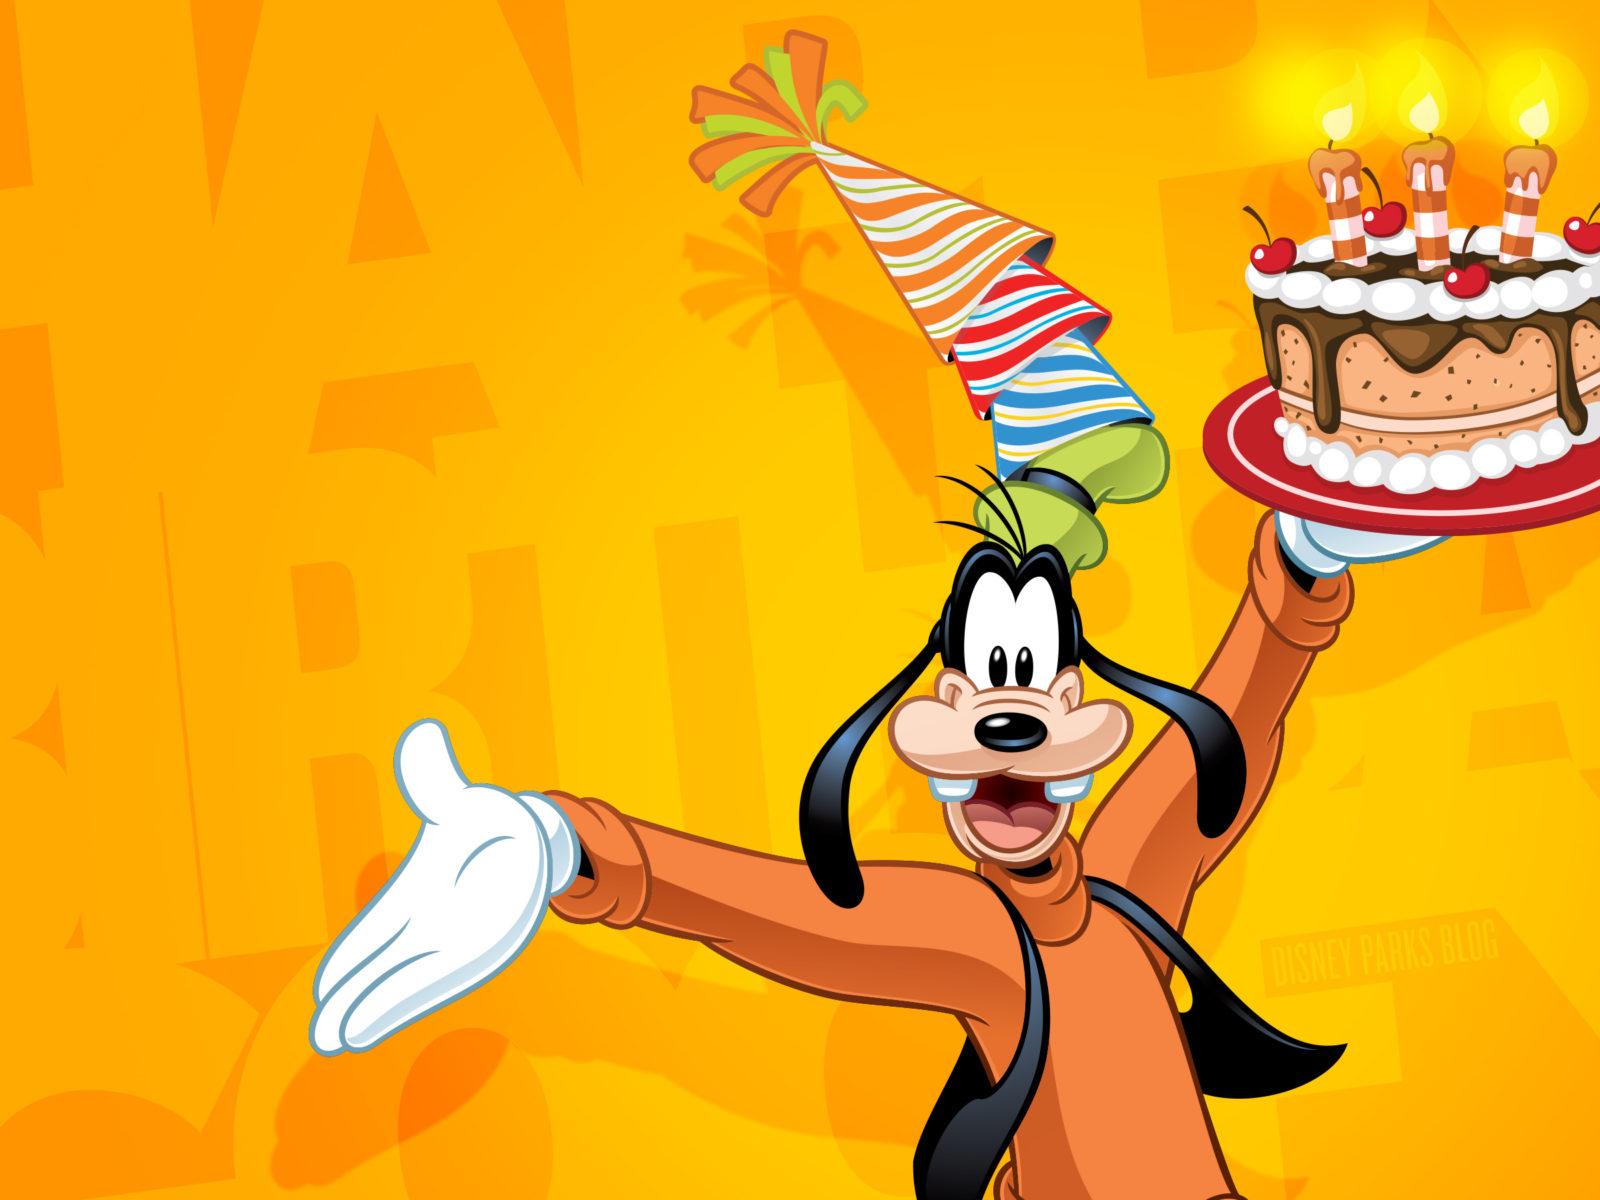 Kingdom Hearts Iphone Wallpaper Goofy Celebrate Happy Birthday Disney Wallpaper 2880x1800